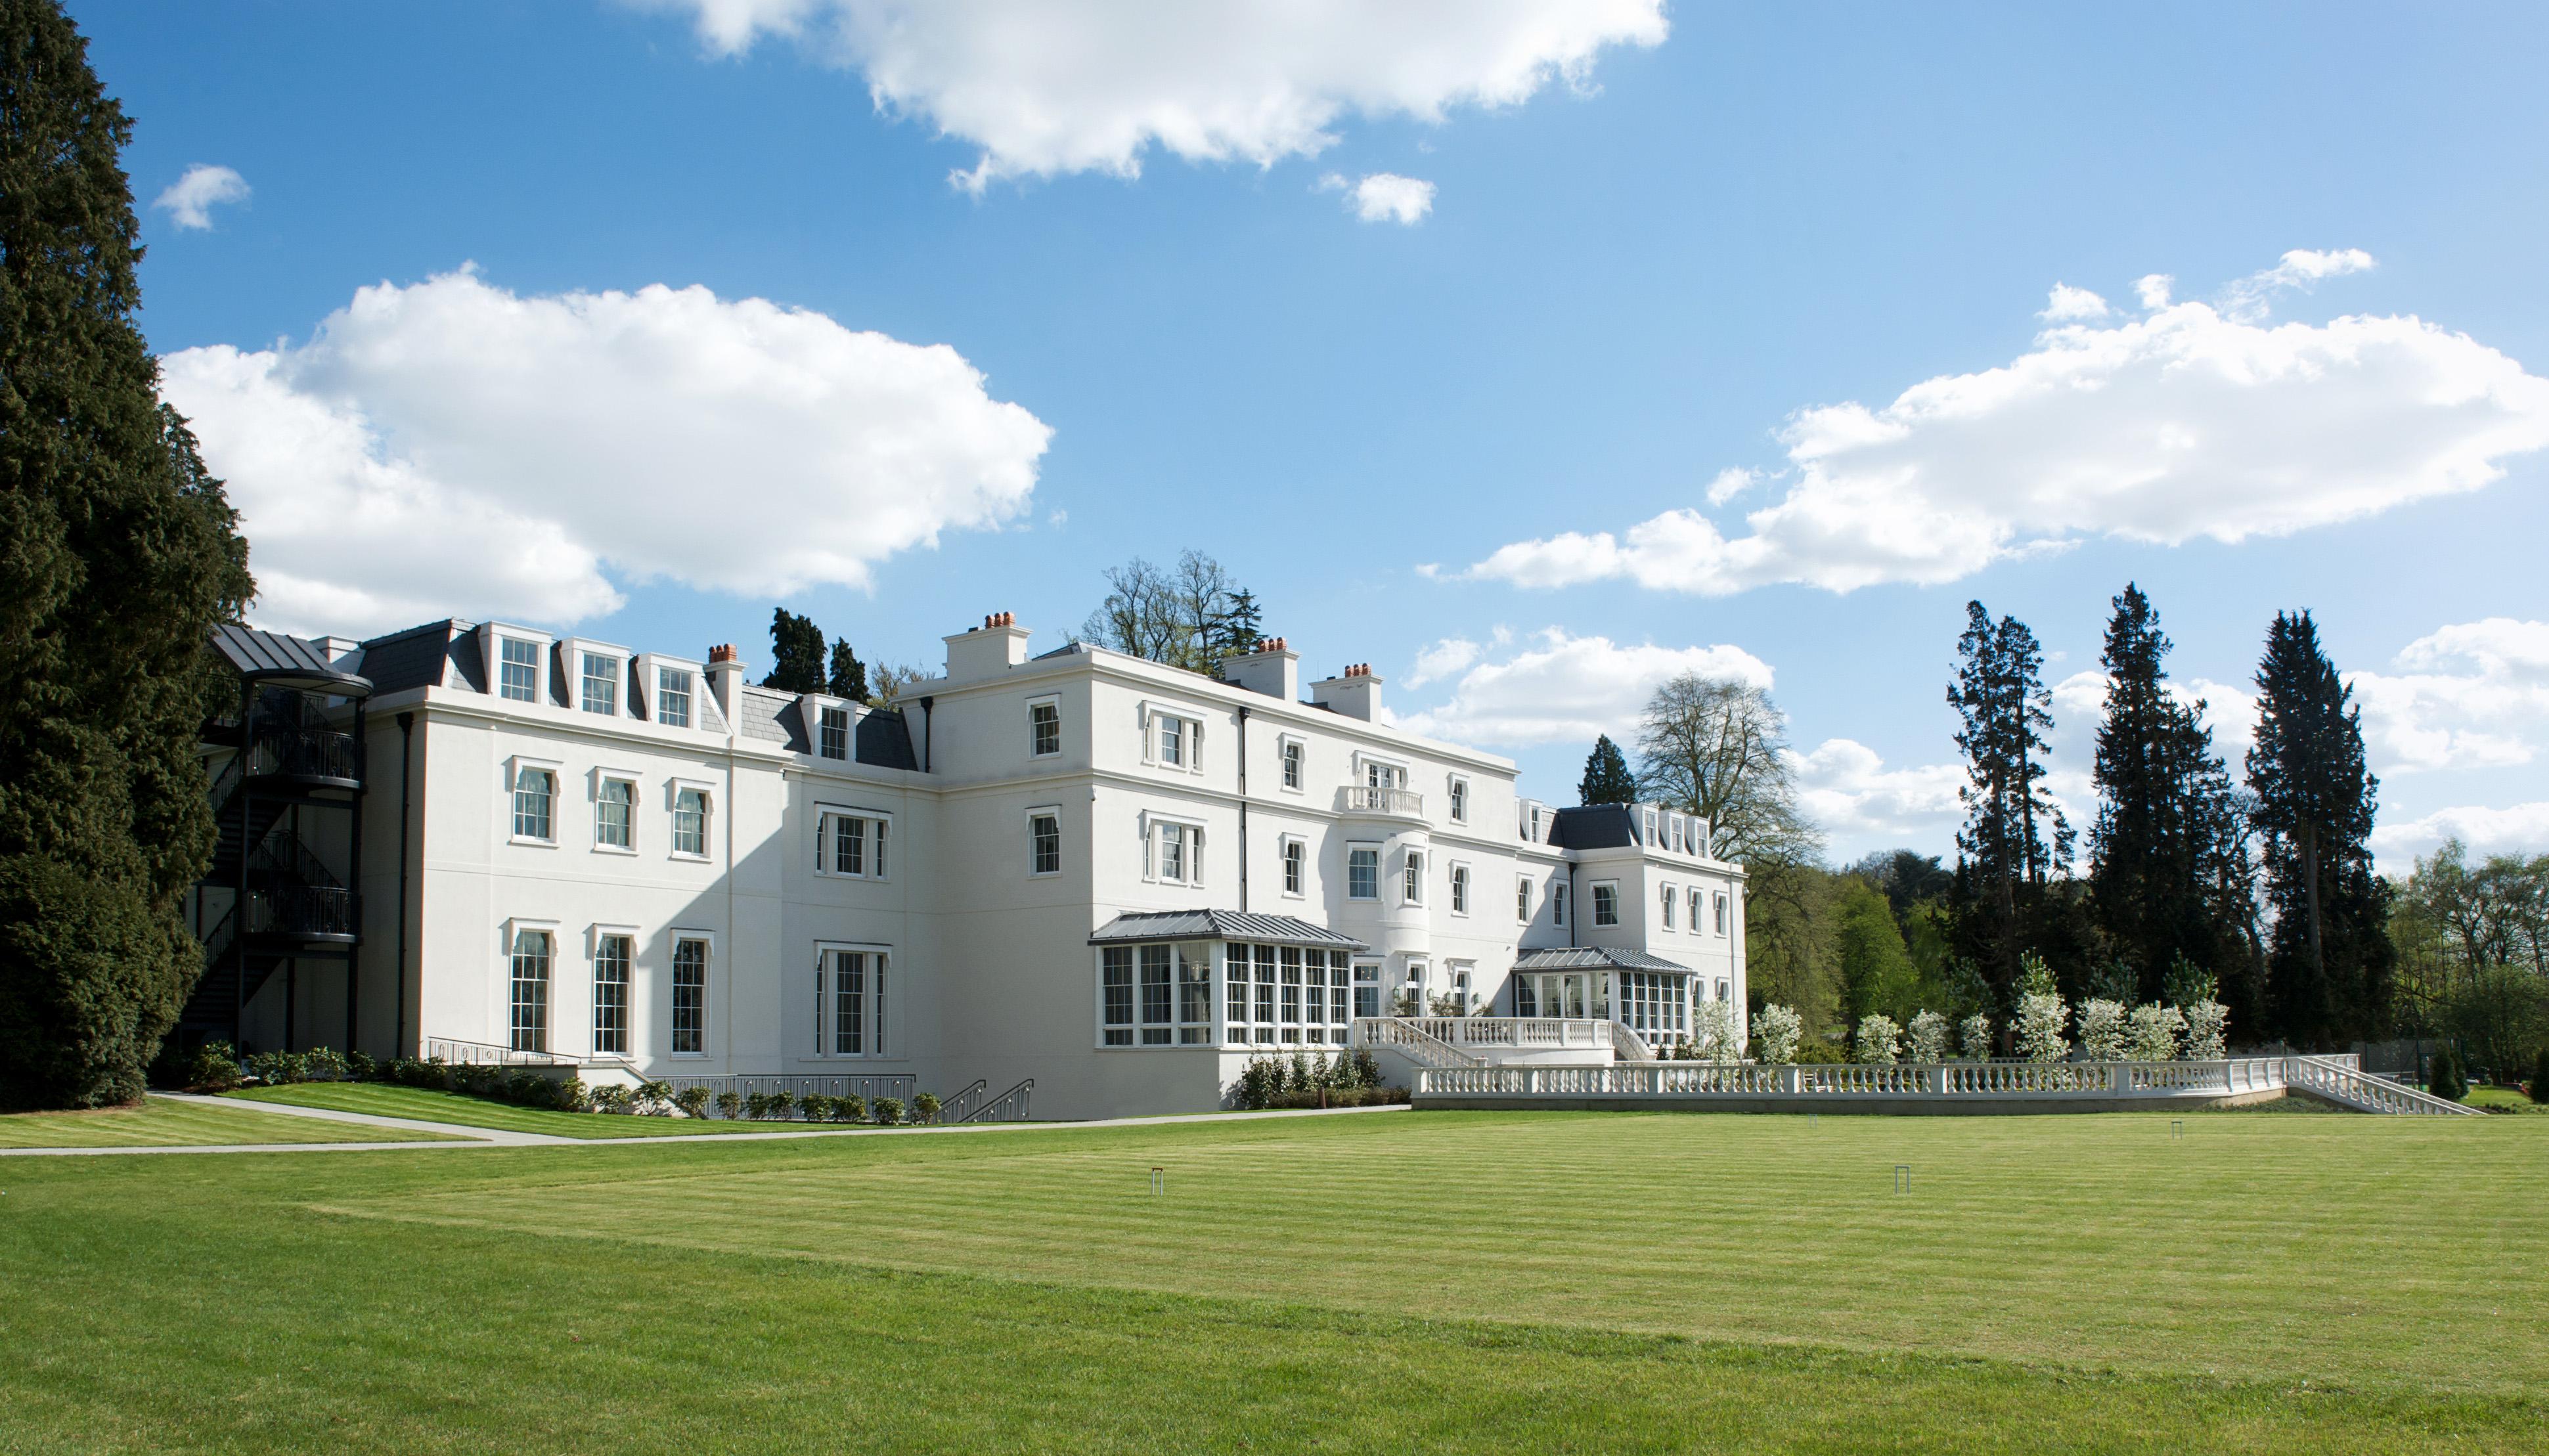 honeymoon destinations coworth park estate grass